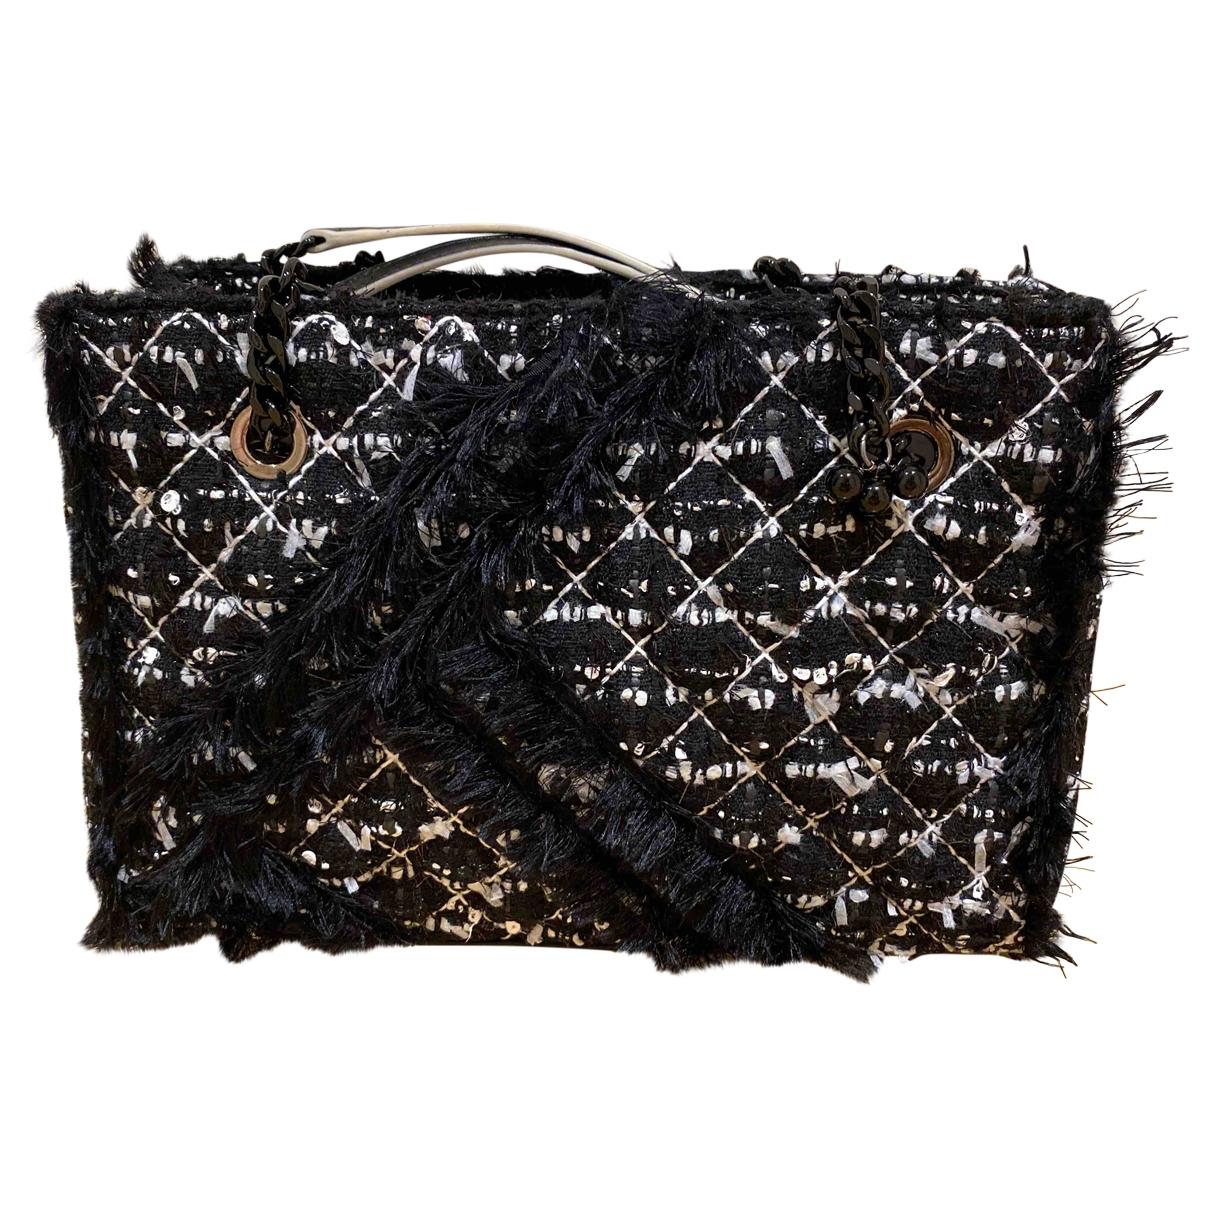 Carolina Herrera \N Black Cloth handbag for Women \N